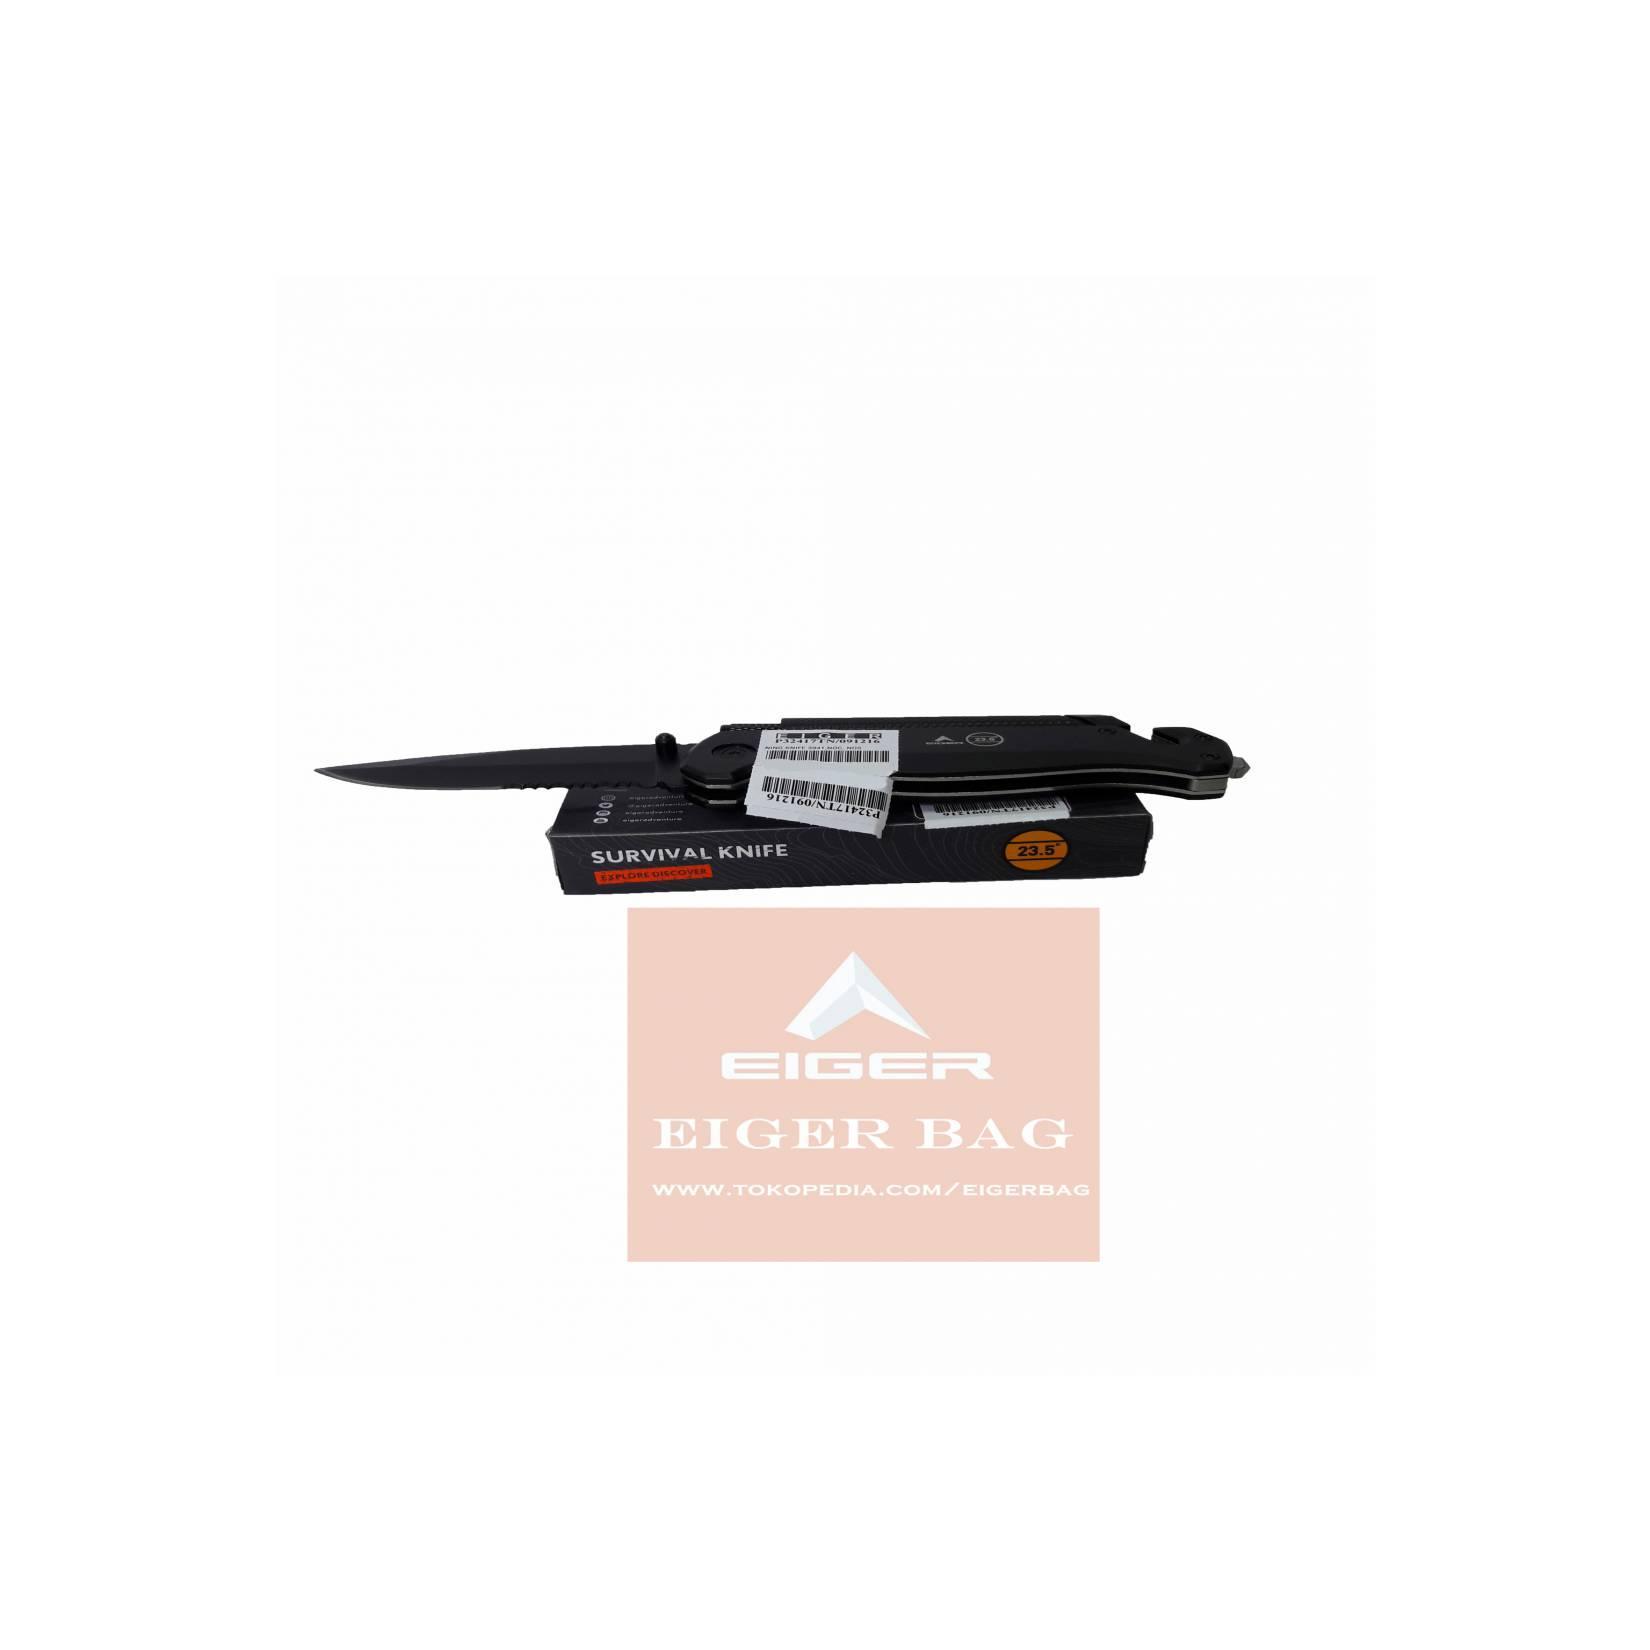 Pisau Lipat Eiger P324 NING KNIFE 3941 ORIGINAL